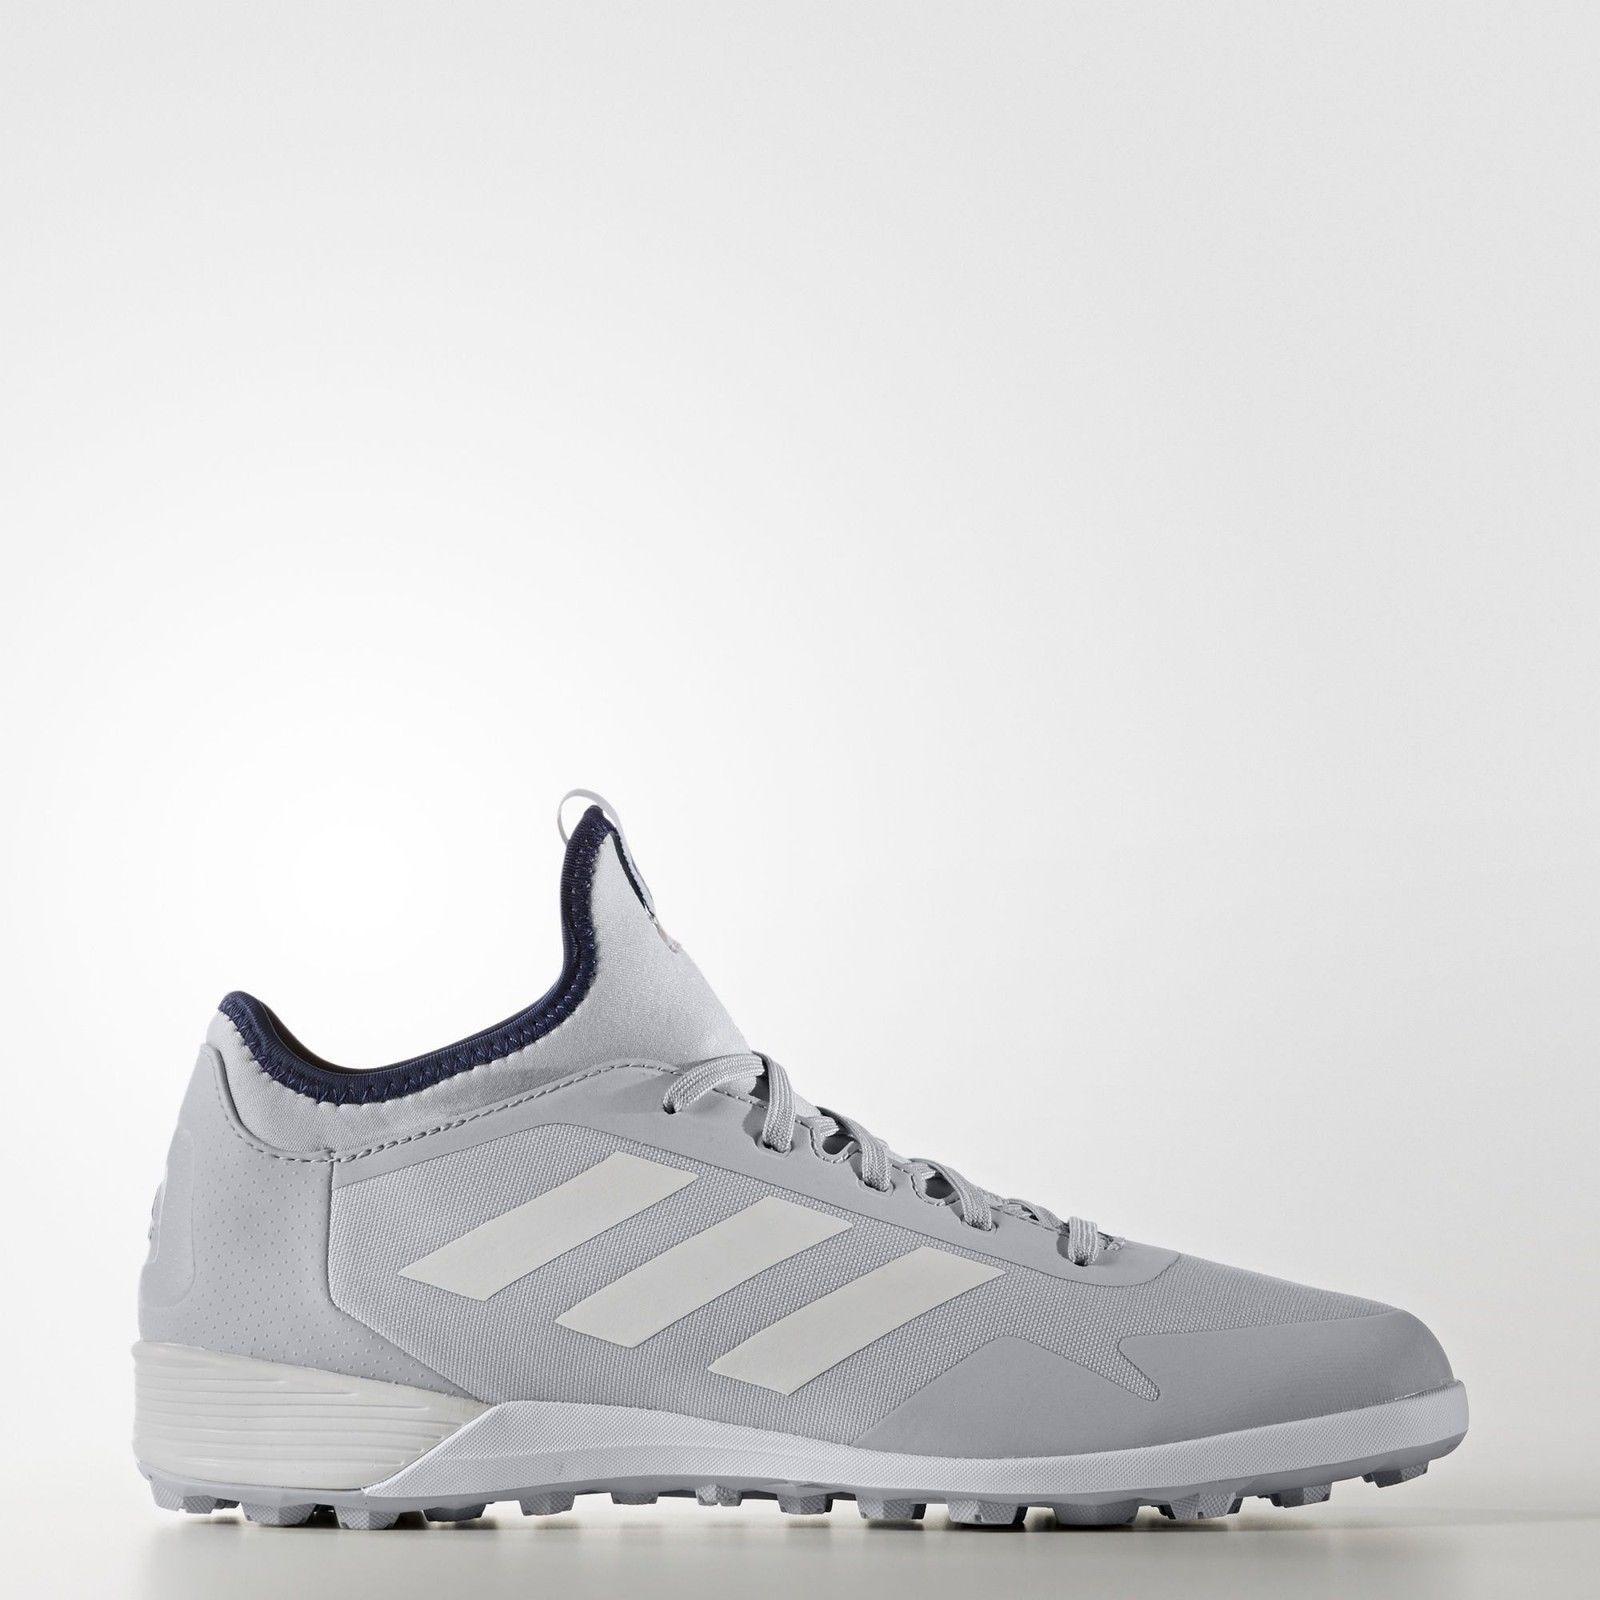 Adidas Ace Tango 17.2 Turf Shoes Men'S Grey